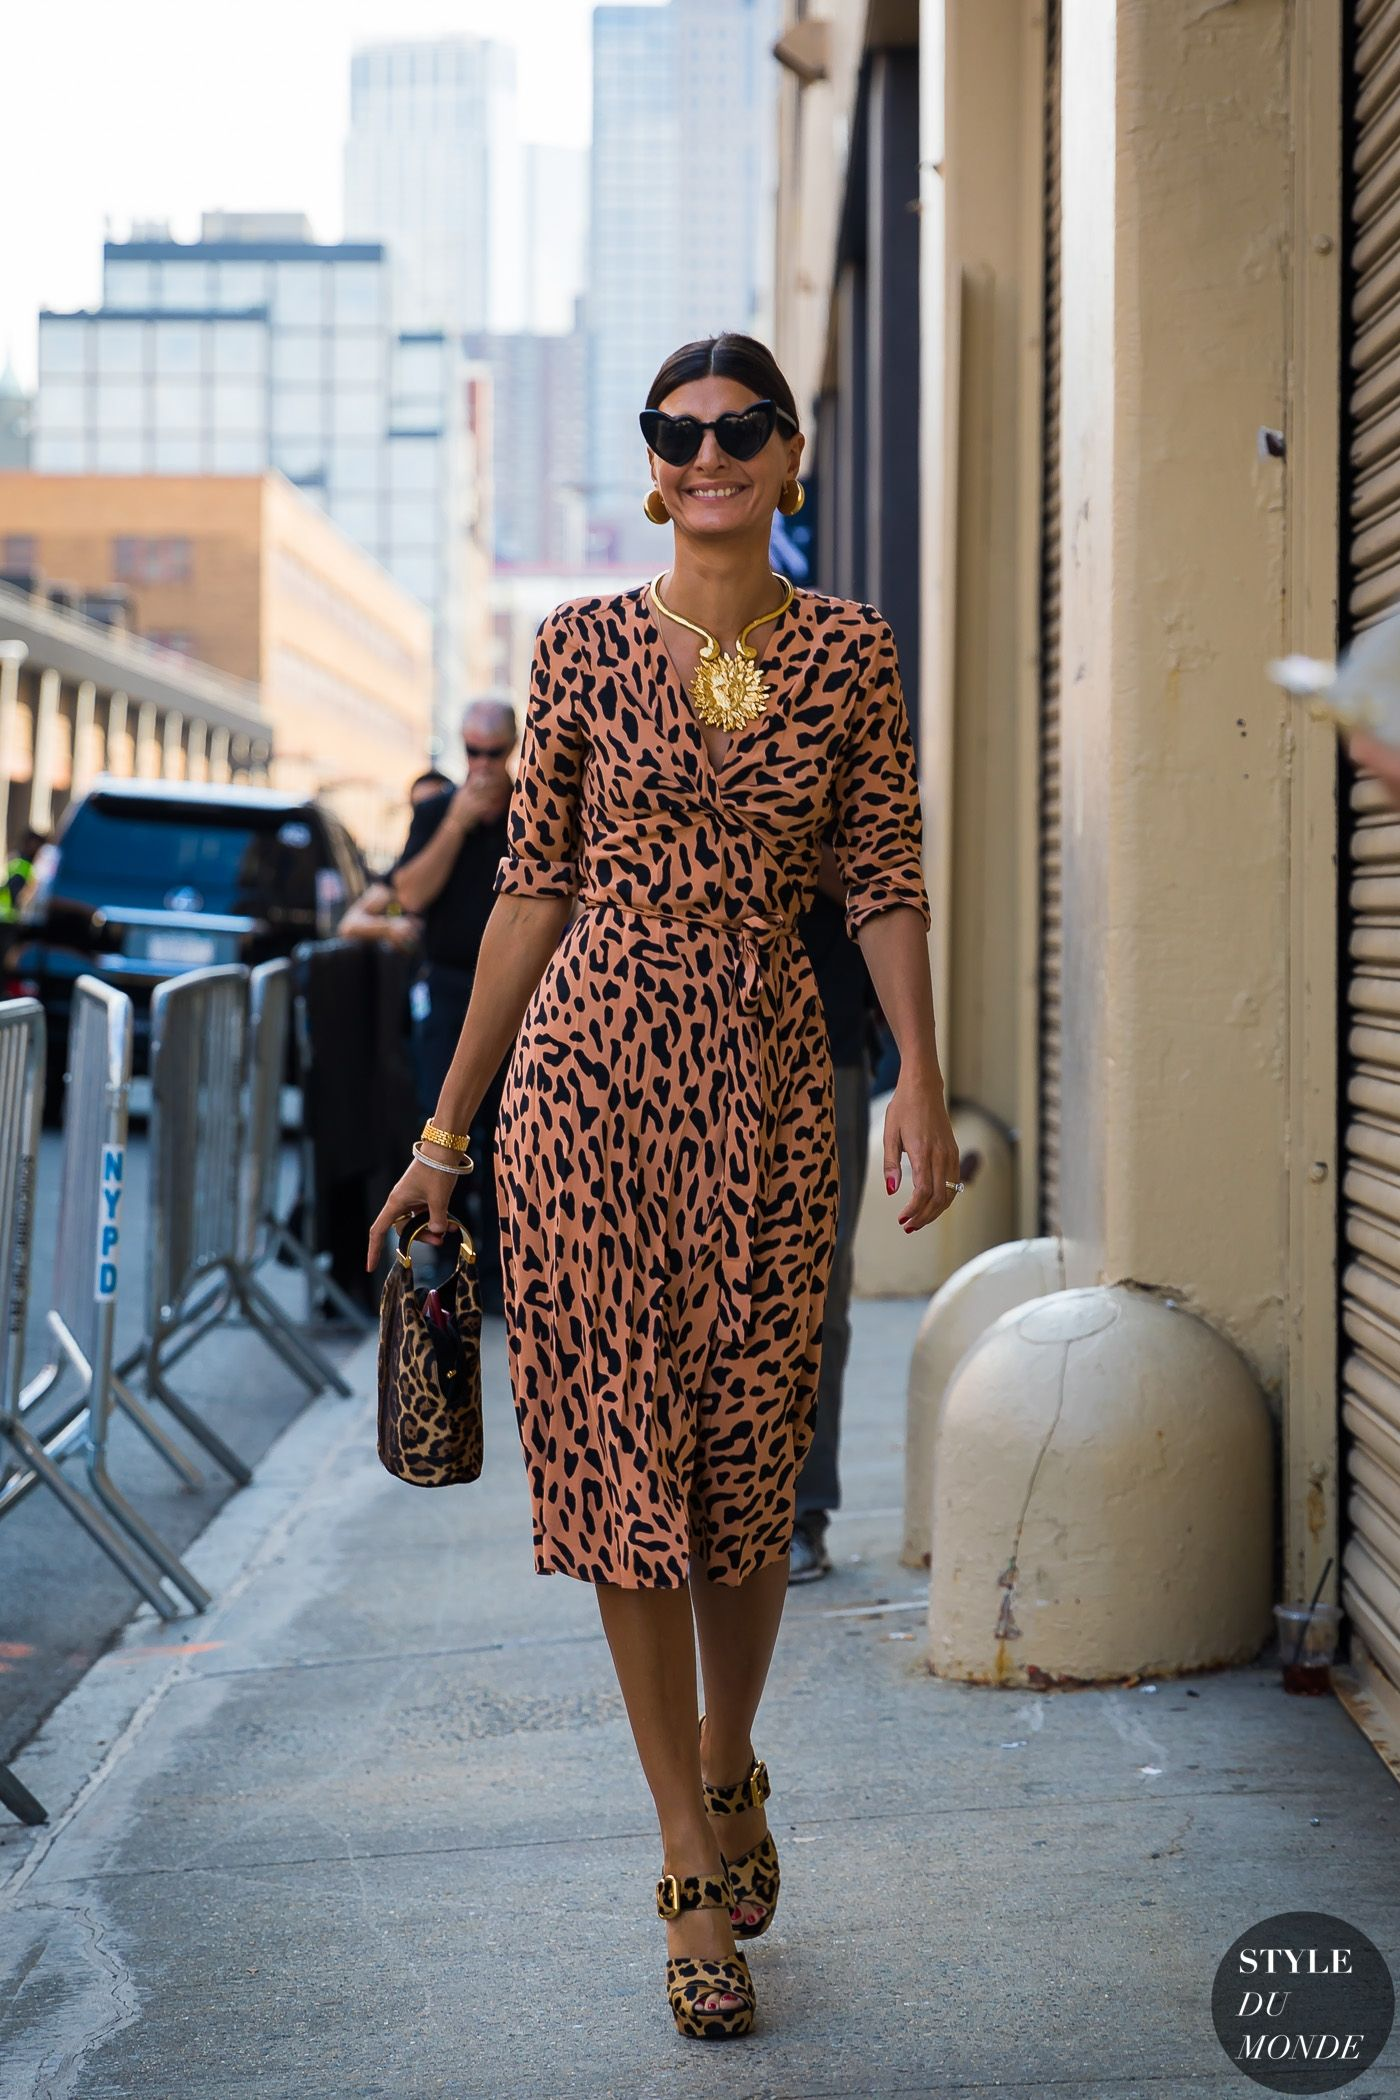 cdf1812f5af Giovanna Battaglia Englebert in DVF leopard print wrap dress.